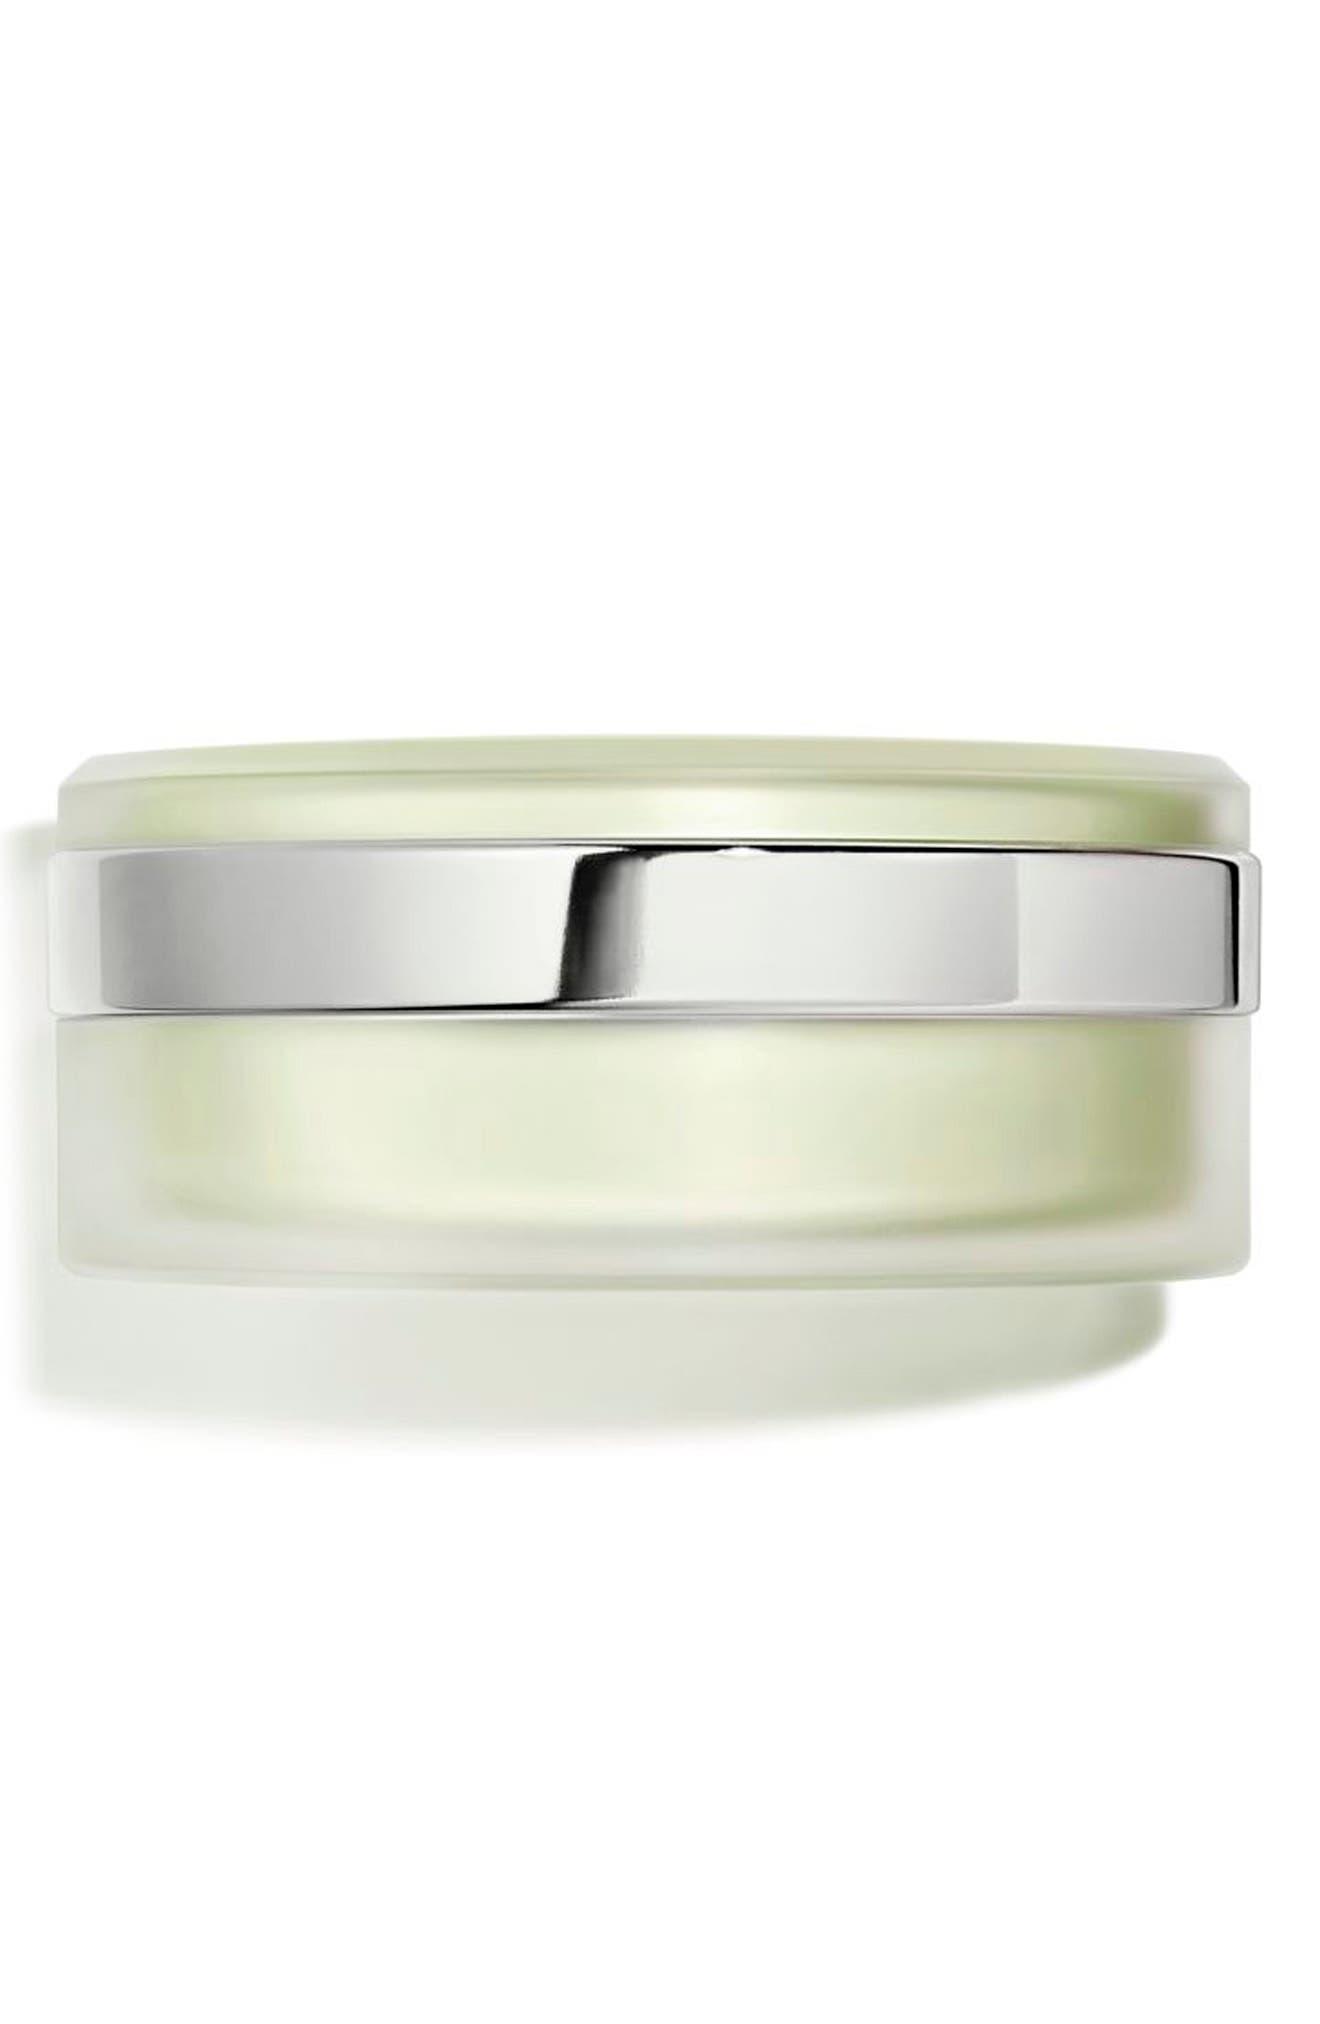 CHANEL CHANCE EAU FRAÎCHE Moisturizing Body Cream | Nordstrom